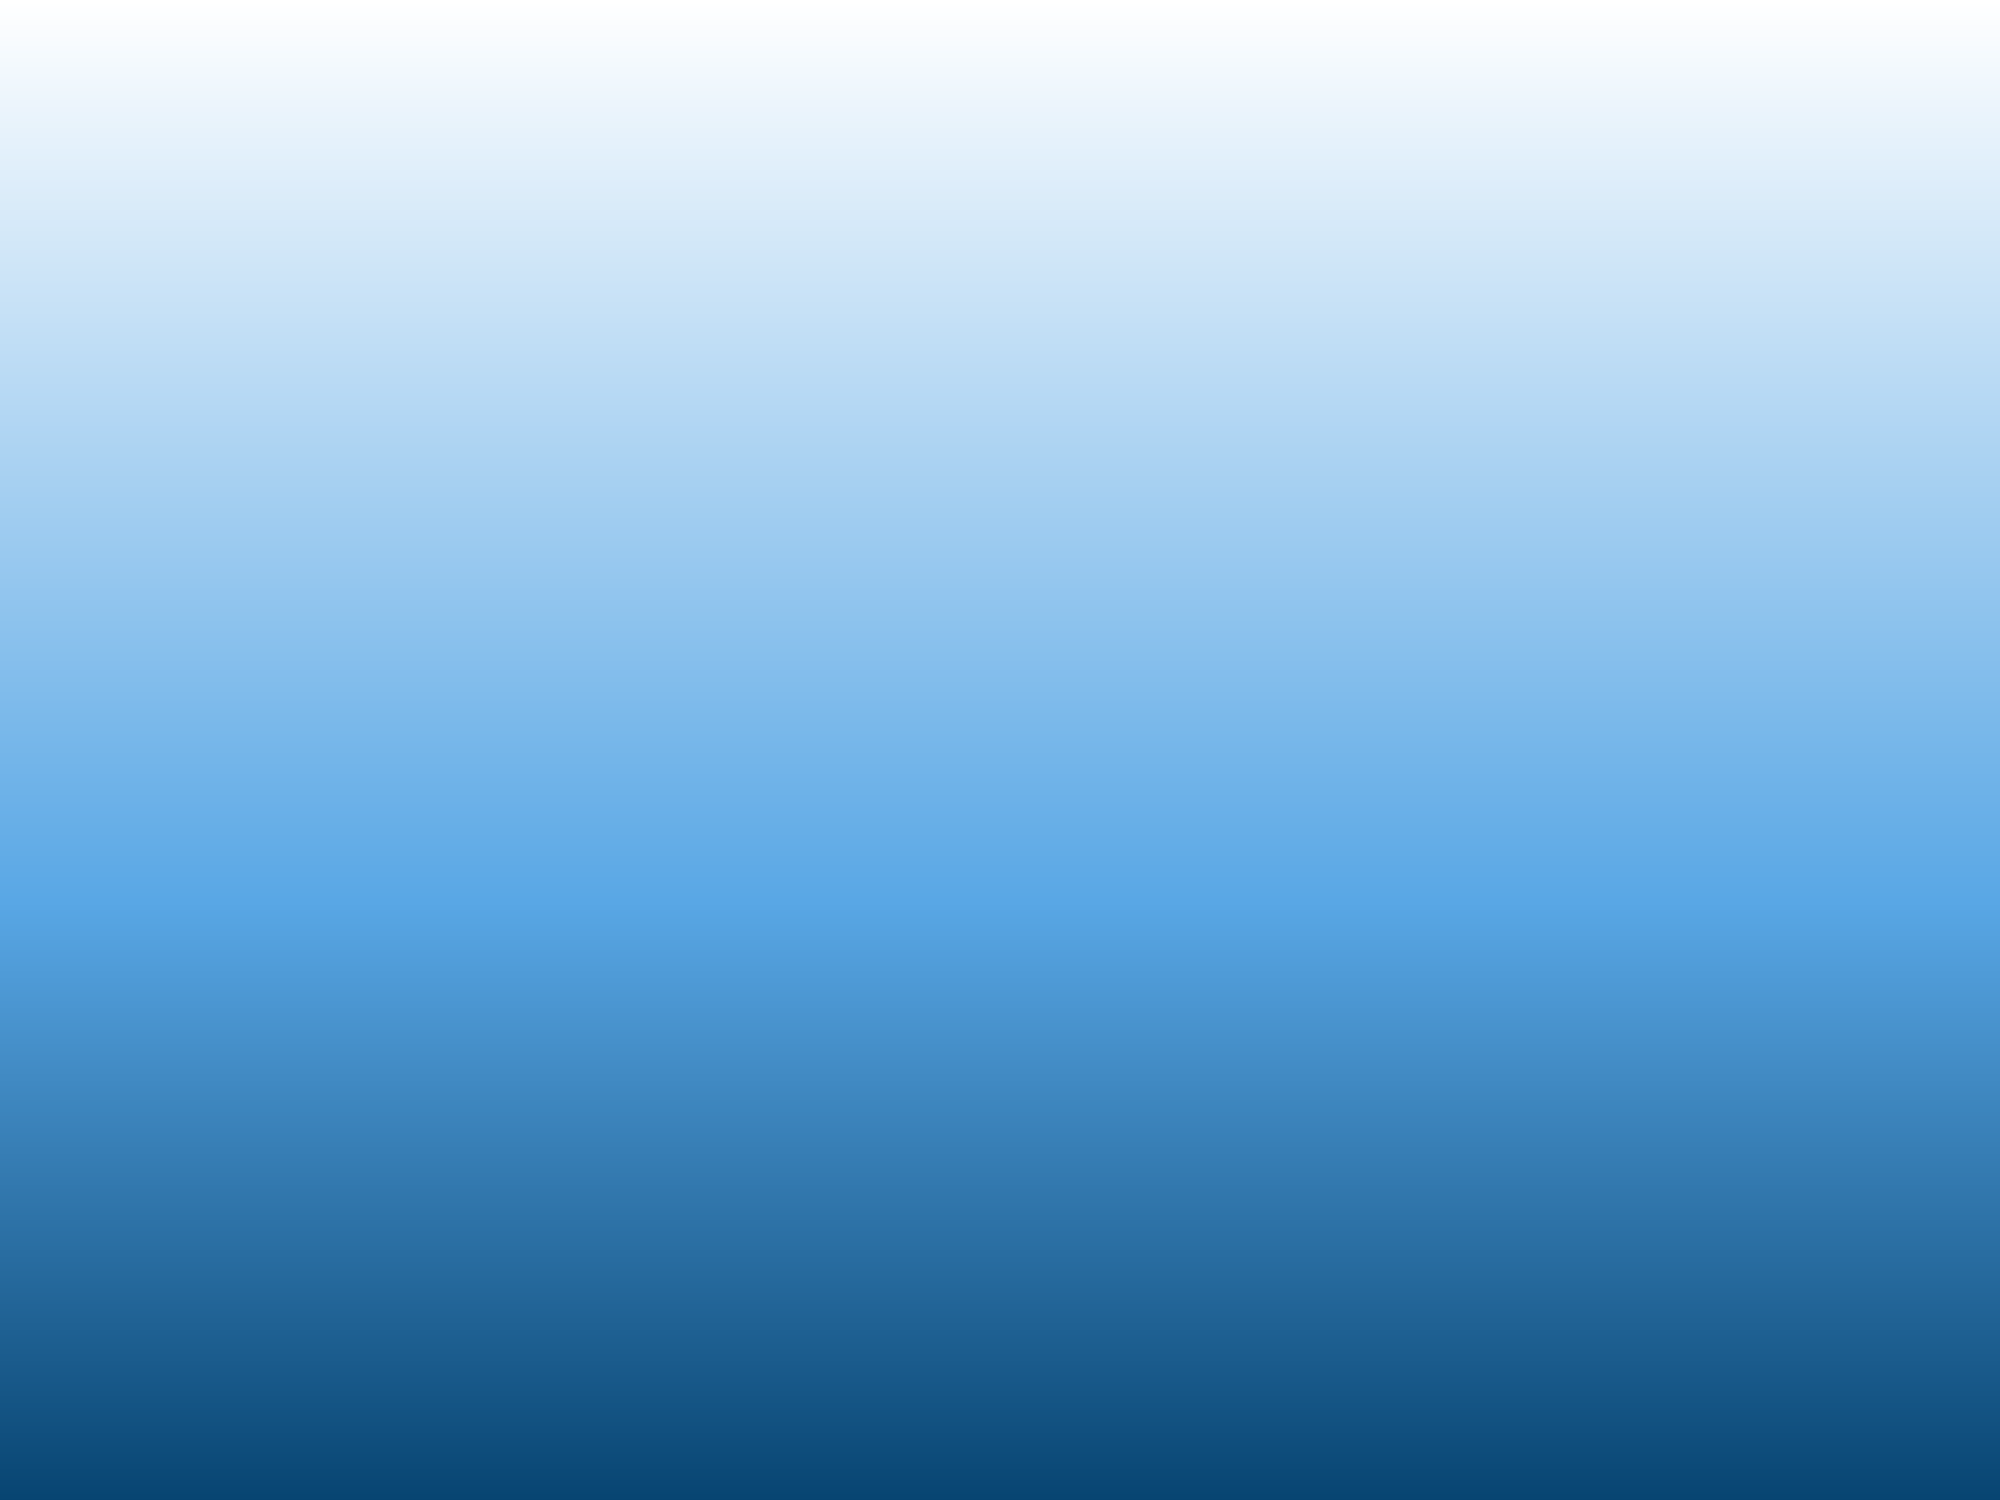 Download Free Light Blue Gradient Light Blue Gradient Png